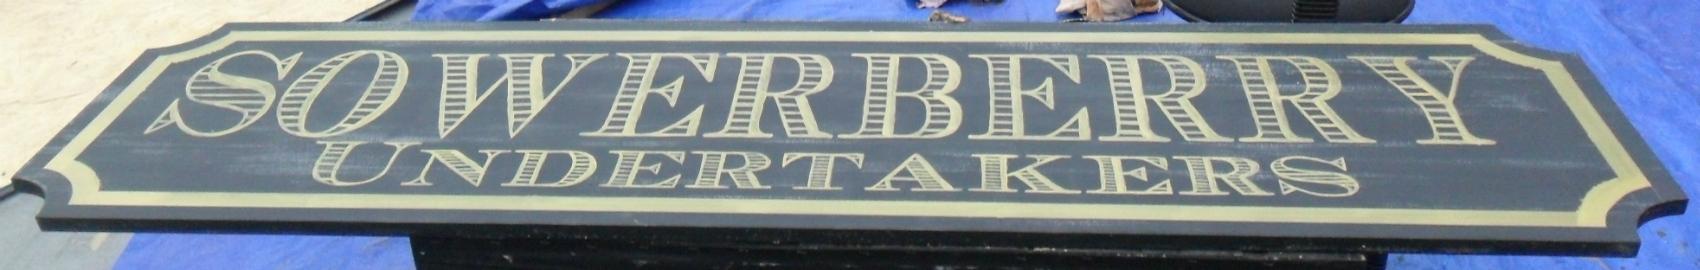 Tewksbury Arts - Hand Painted Sign